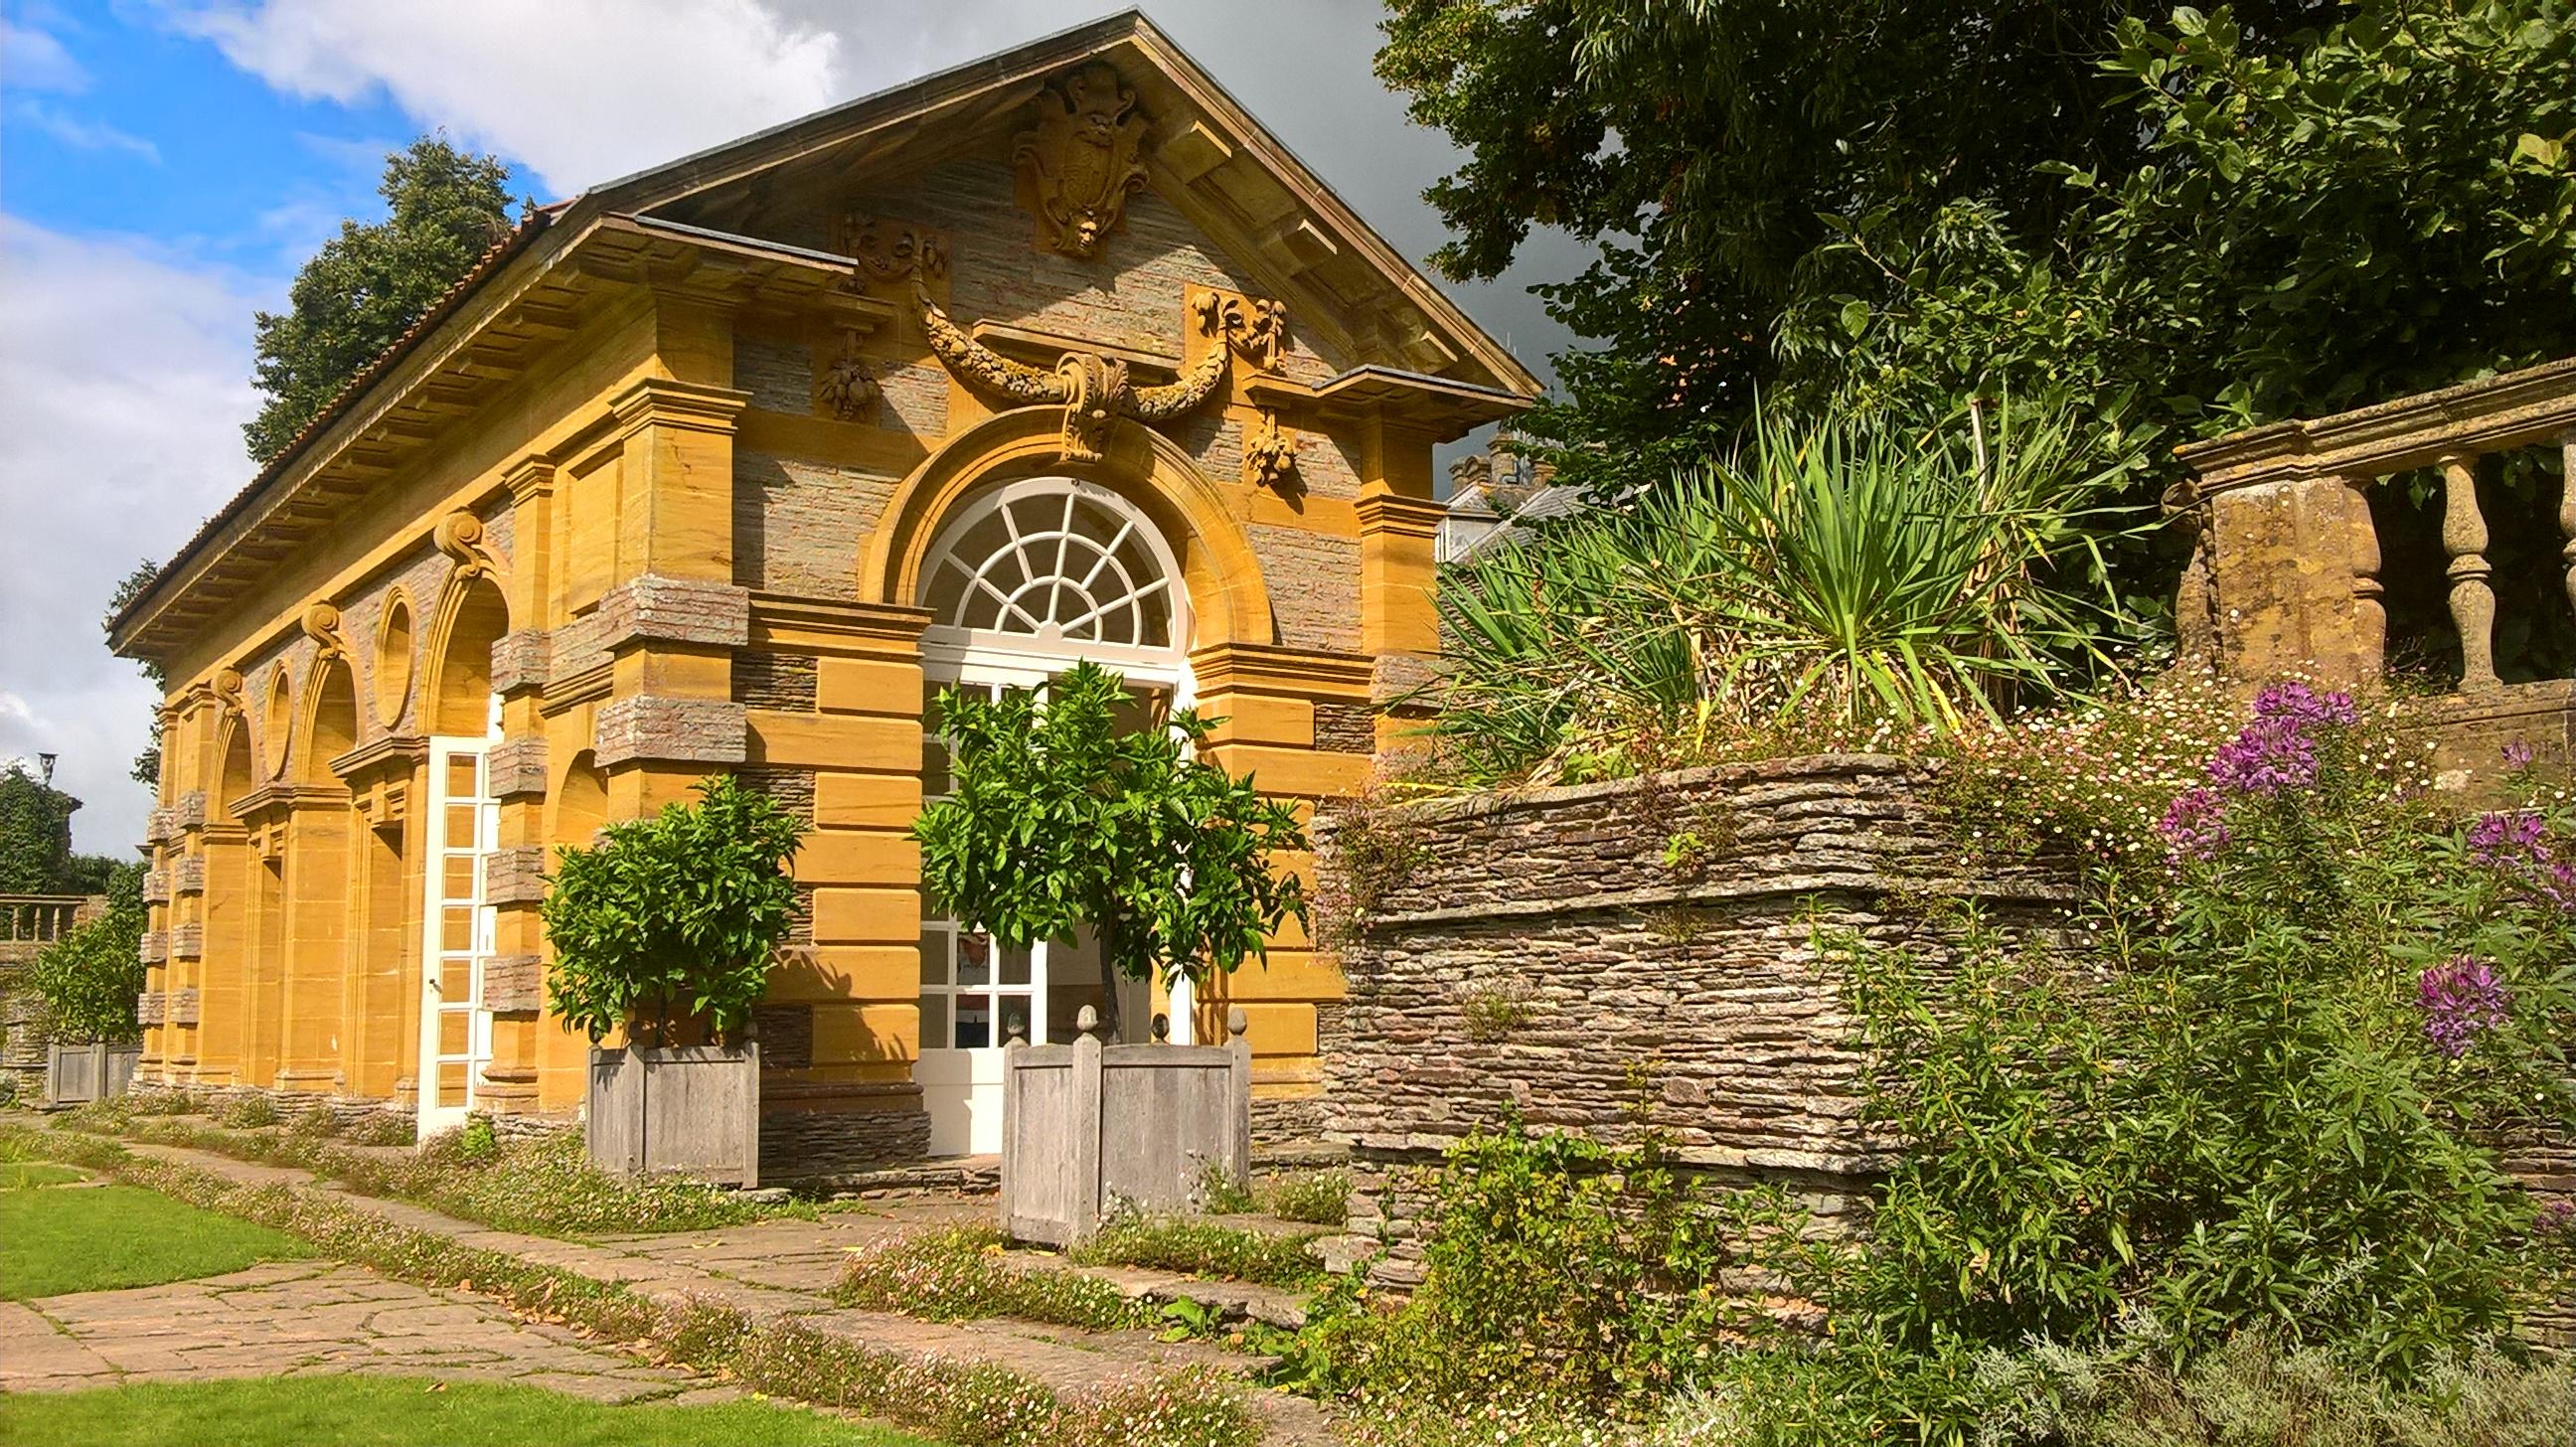 West Country Gardens | Old School Garden